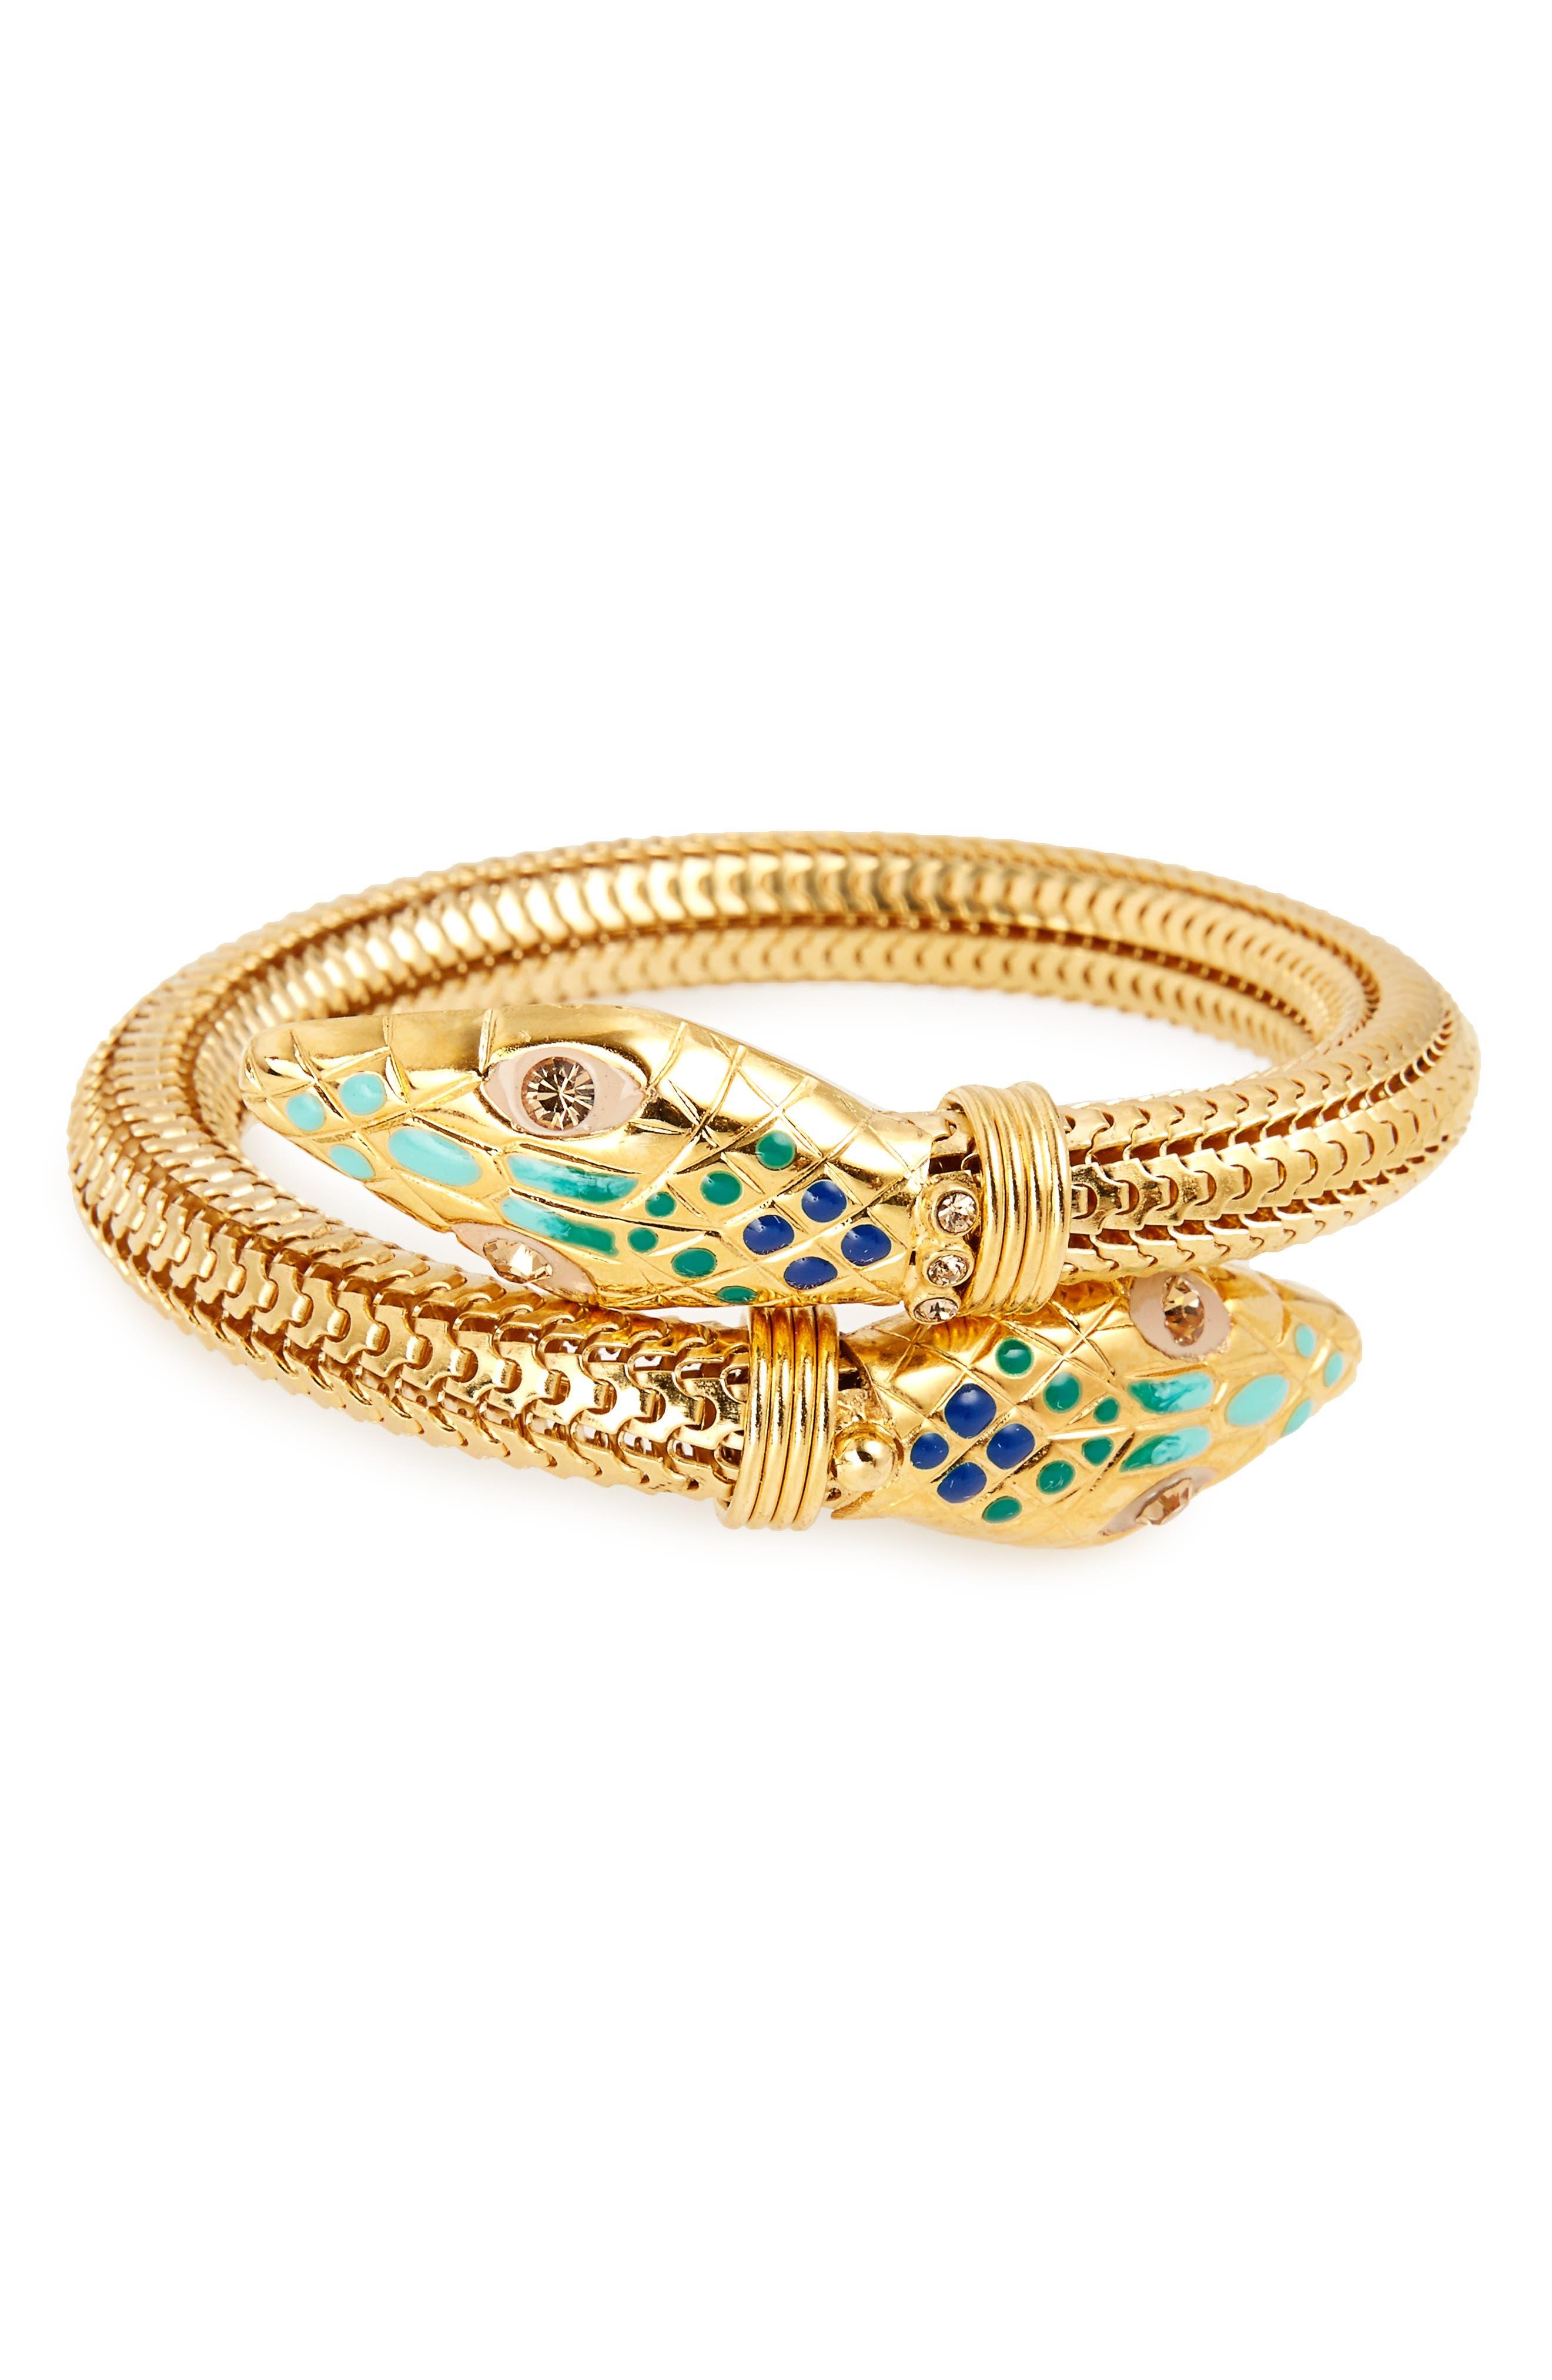 'Cobra' Enameled Bracelet,                         Main,                         color, Blue Turquoise/ Gold